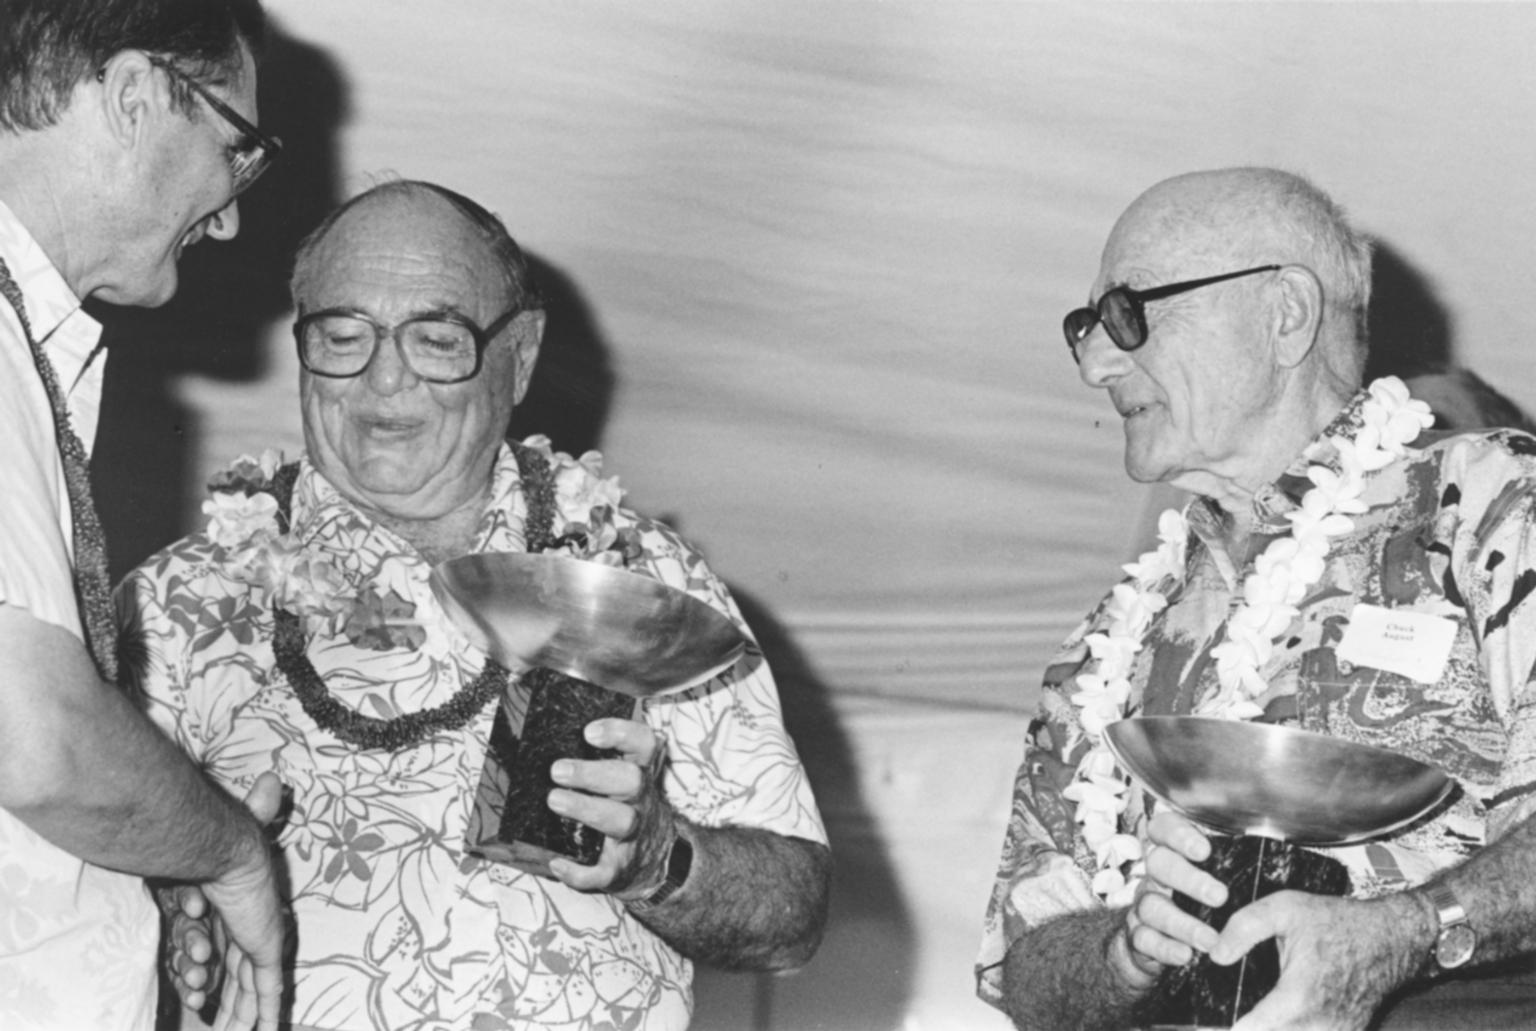 Burton S. and Charles August presented award by RIT President Albert Simone